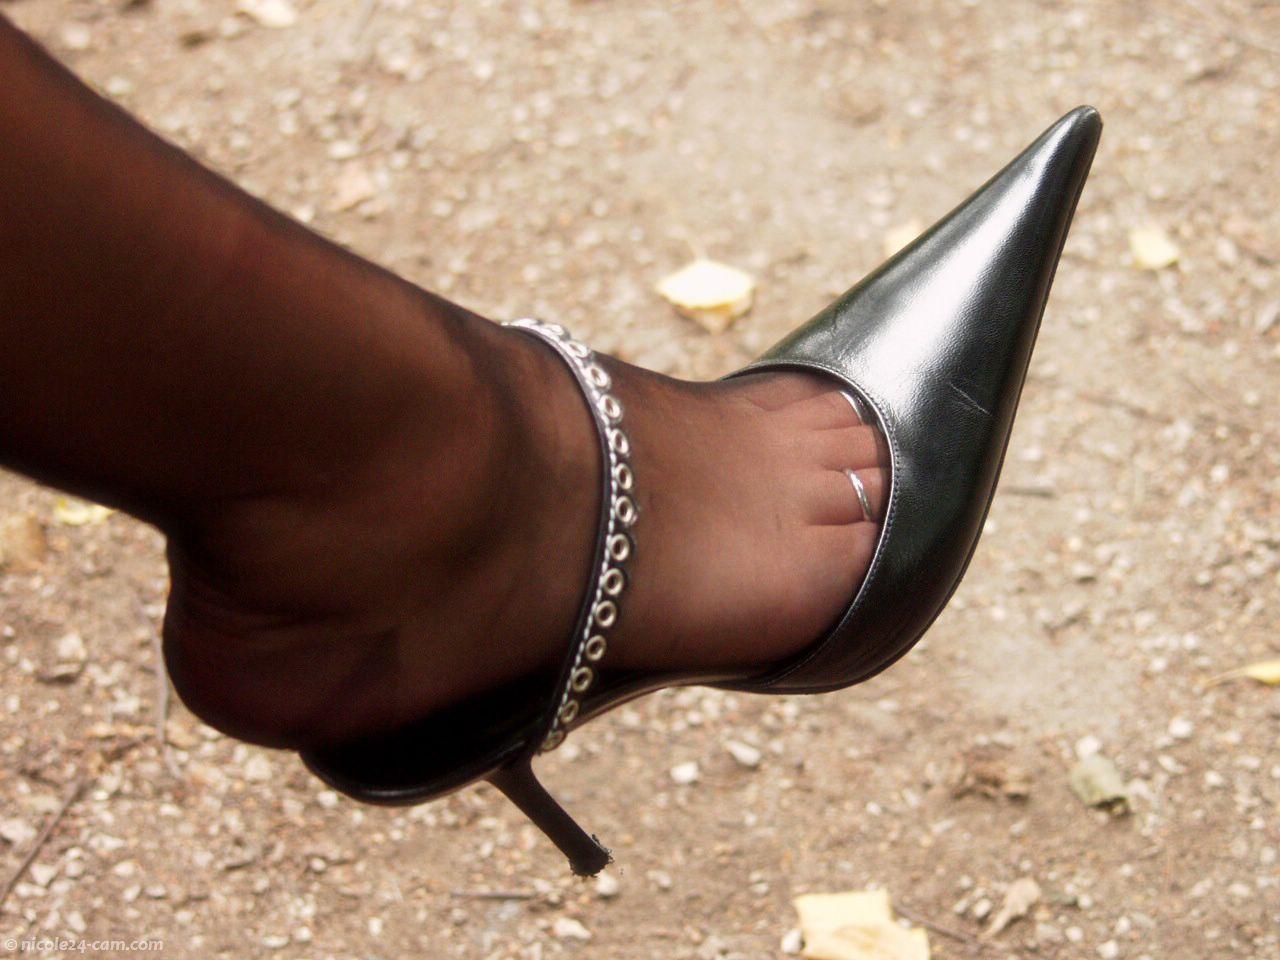 Трамплинг голыми ногами, Трамплинг босиком - видео top Her Flesh HD 3 фотография